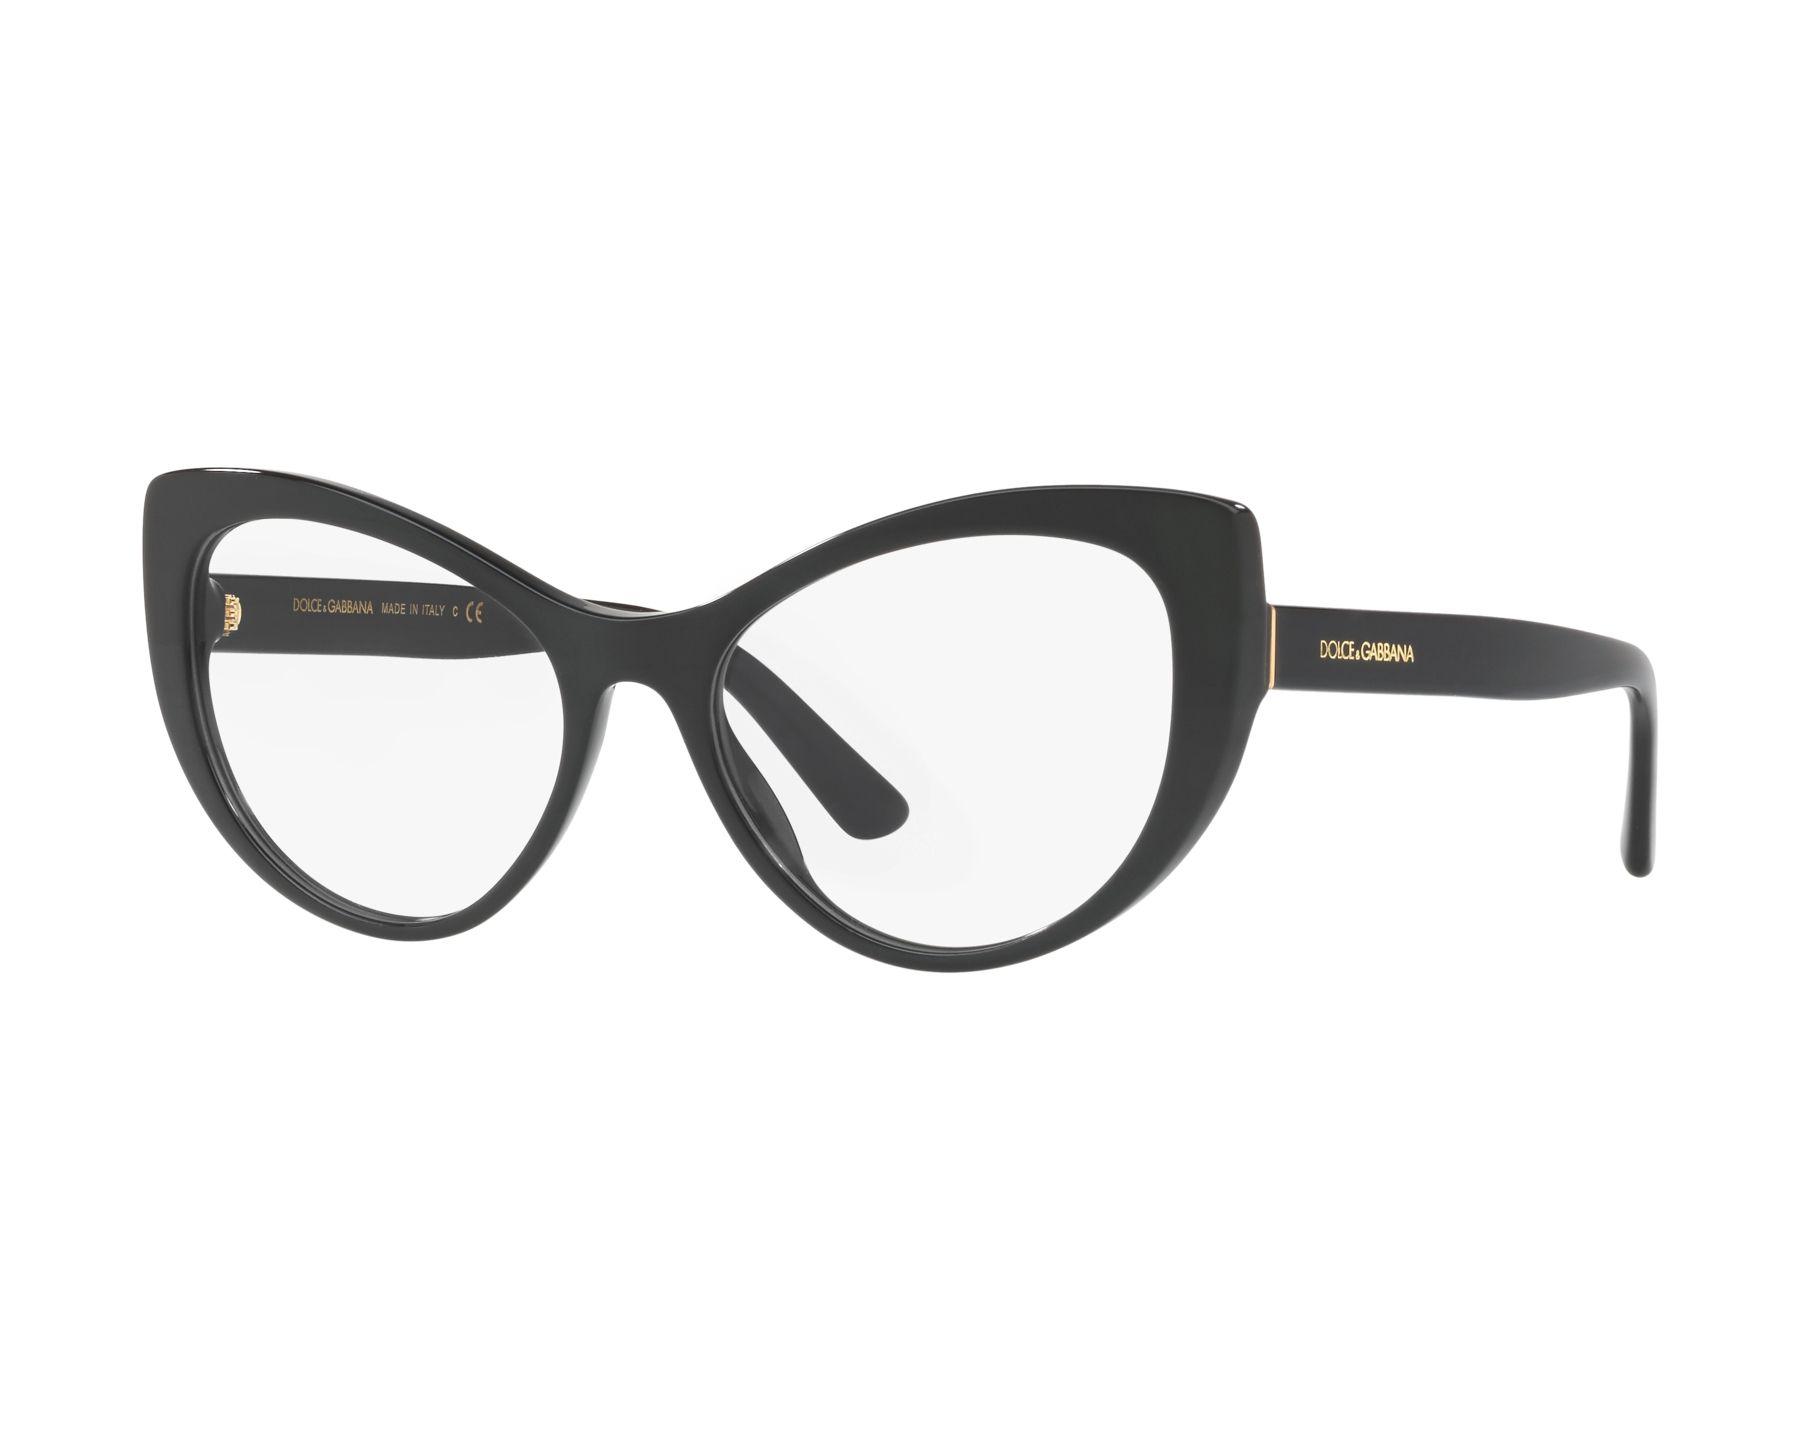 a6df9e4ab890 eyeglasses Dolce   Gabbana DG-3285 501 52-17 Black